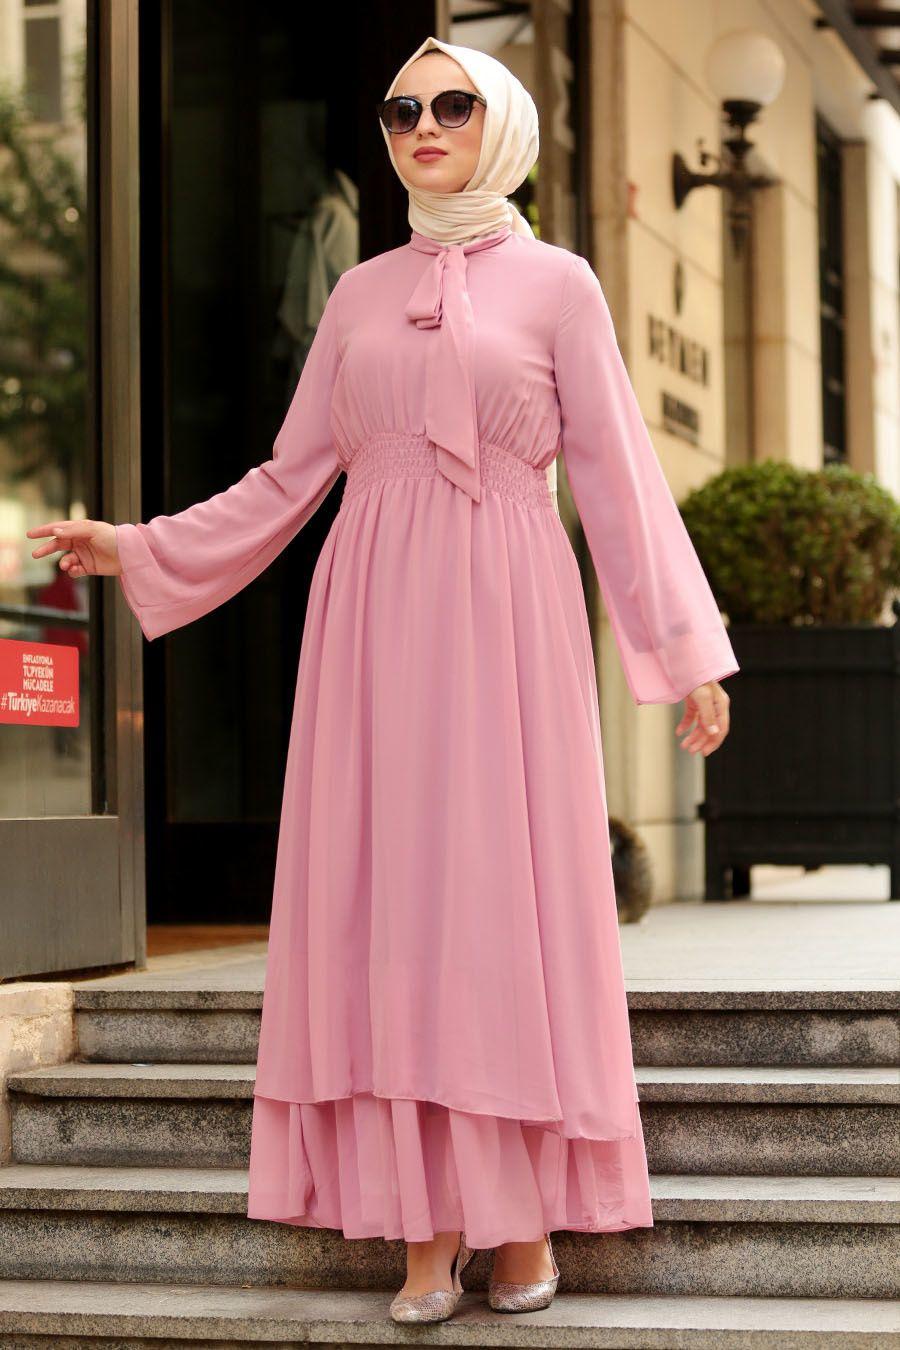 Nayla Collection Fiyonklu Pembe Tesettur Elbise 5006p The Dress Elbise Modelleri Elbise